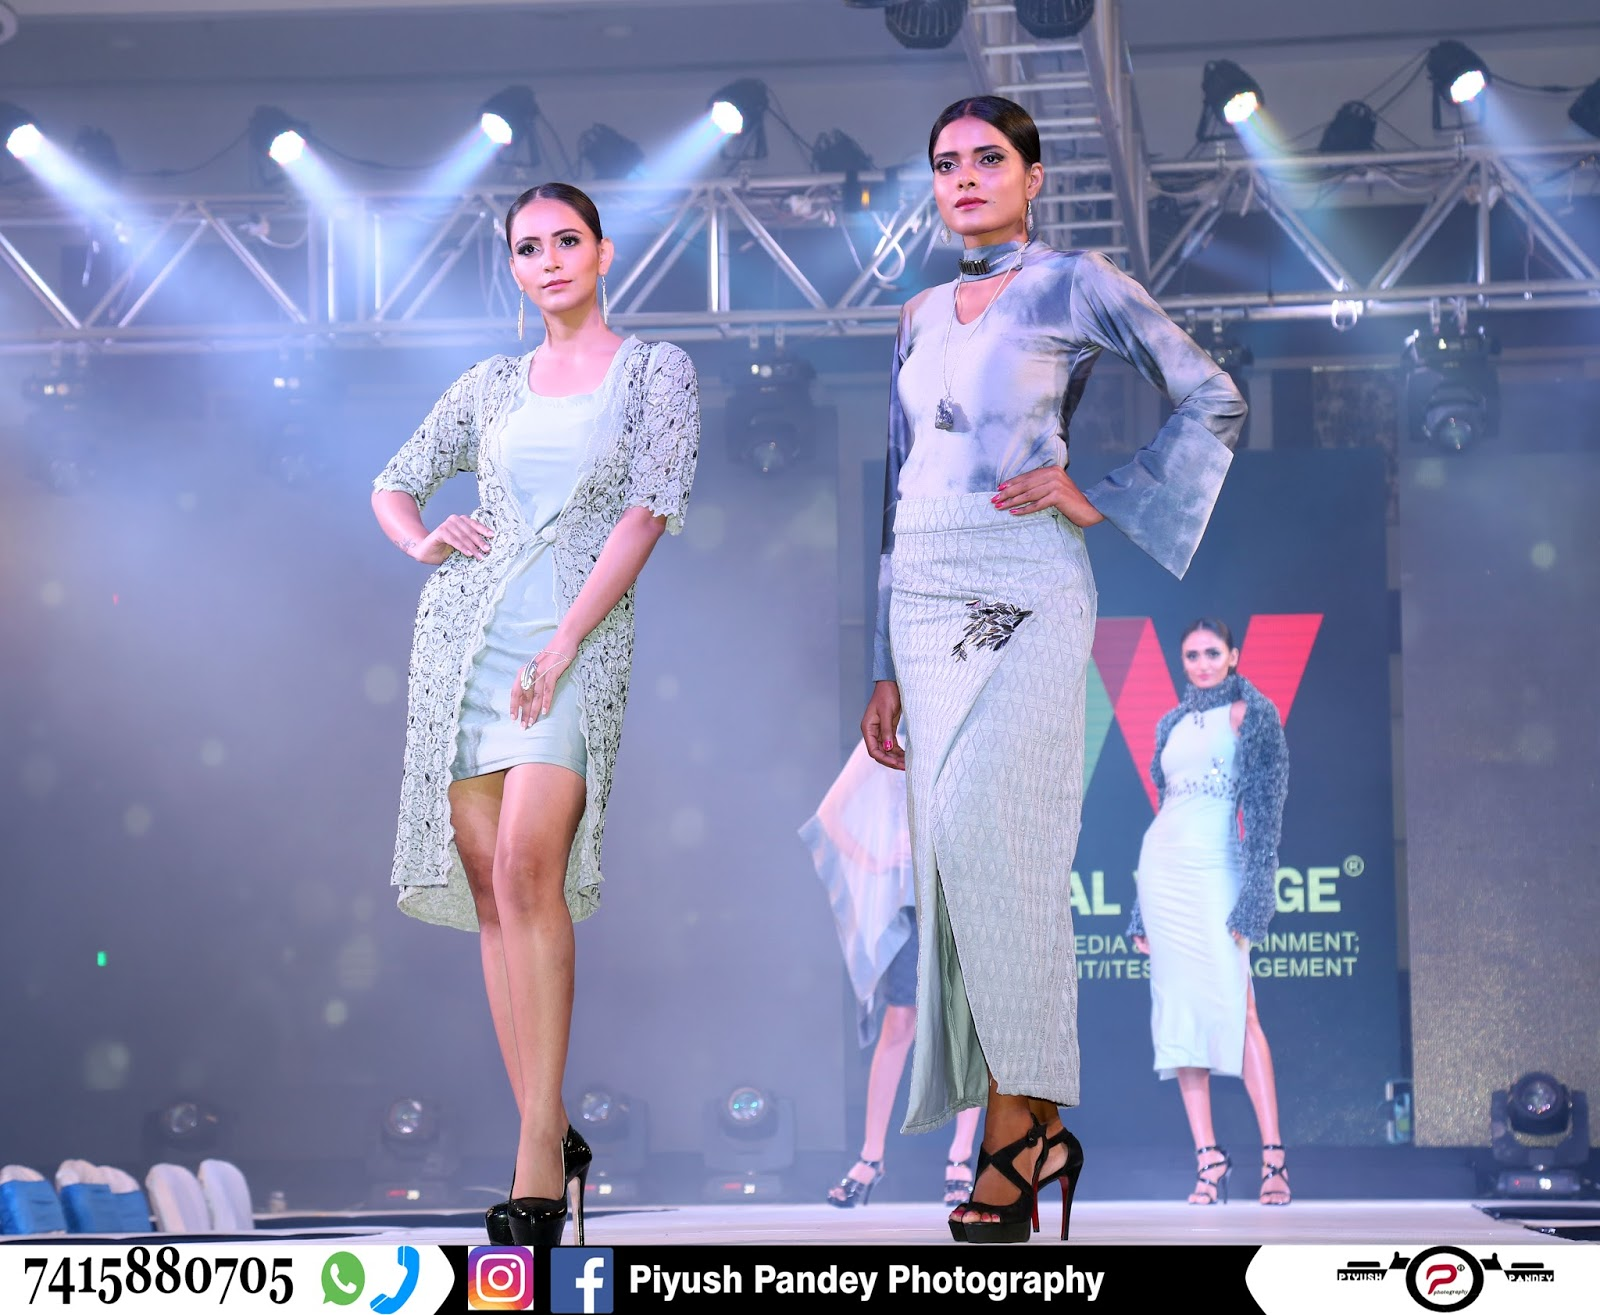 fashion photography   piyushpandeyphotography